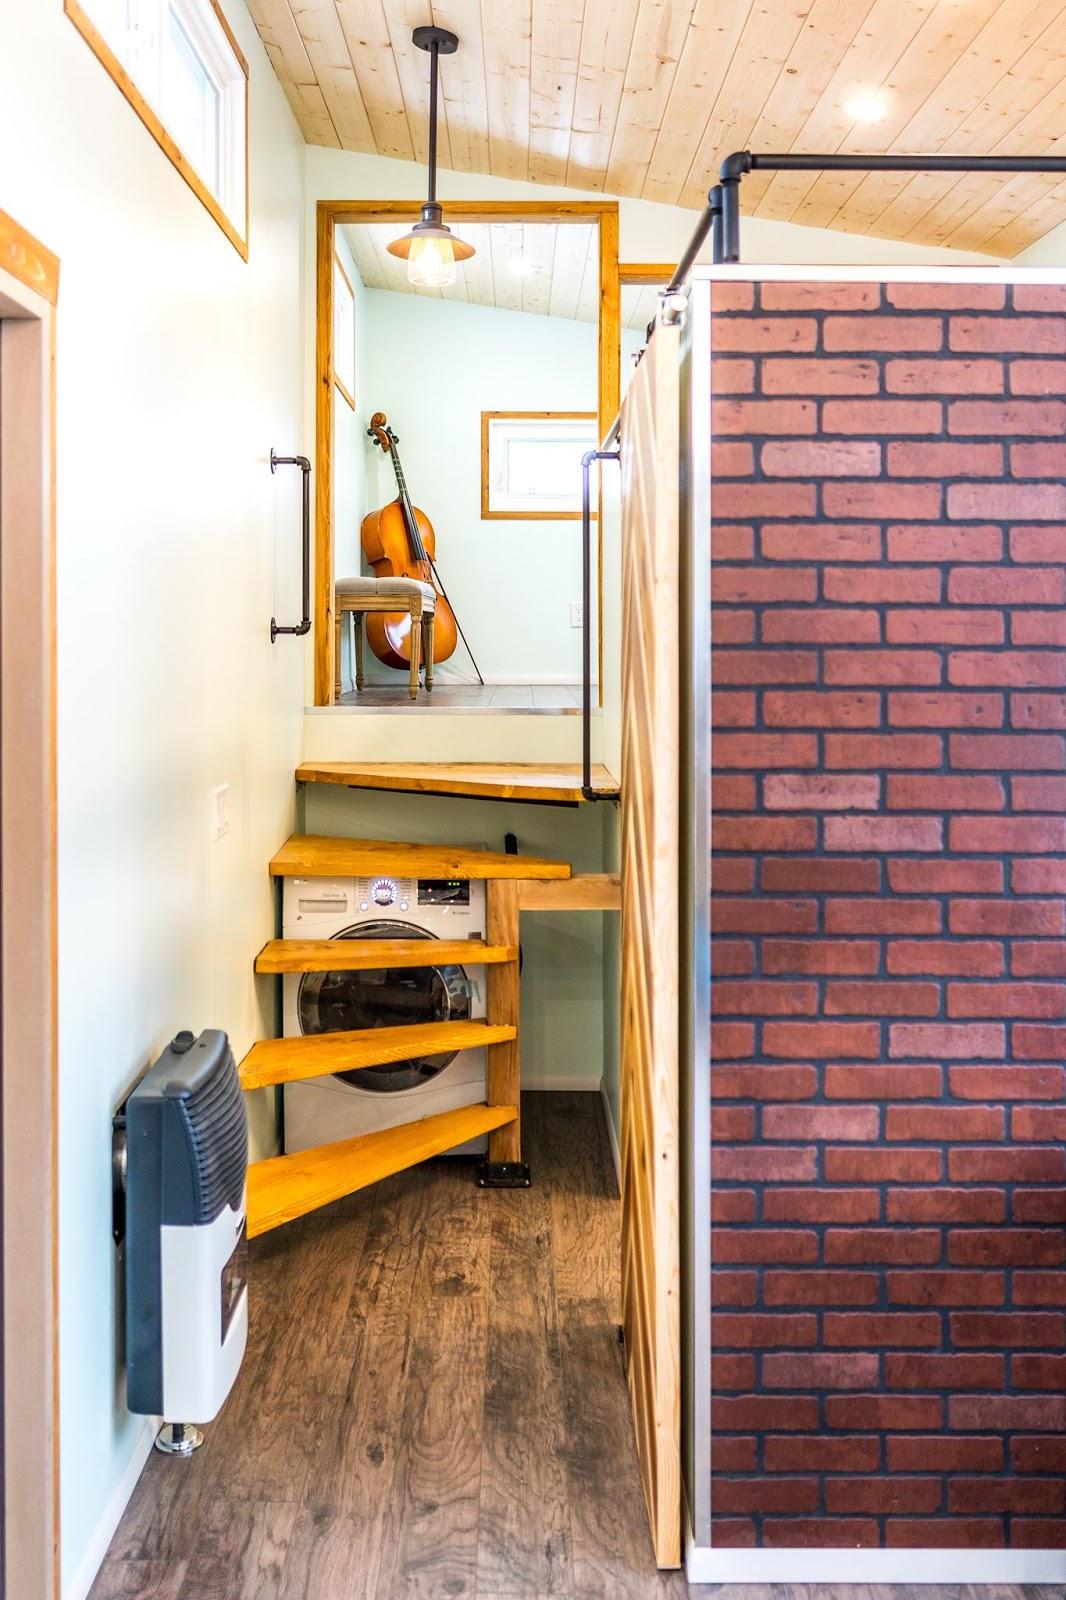 The Vagabond Tiny House (390 Sq Ft) - Tiny House Collectiv on tiny house sketch up, tiny house fad, tiny house blueprints, tiny house 3d model,